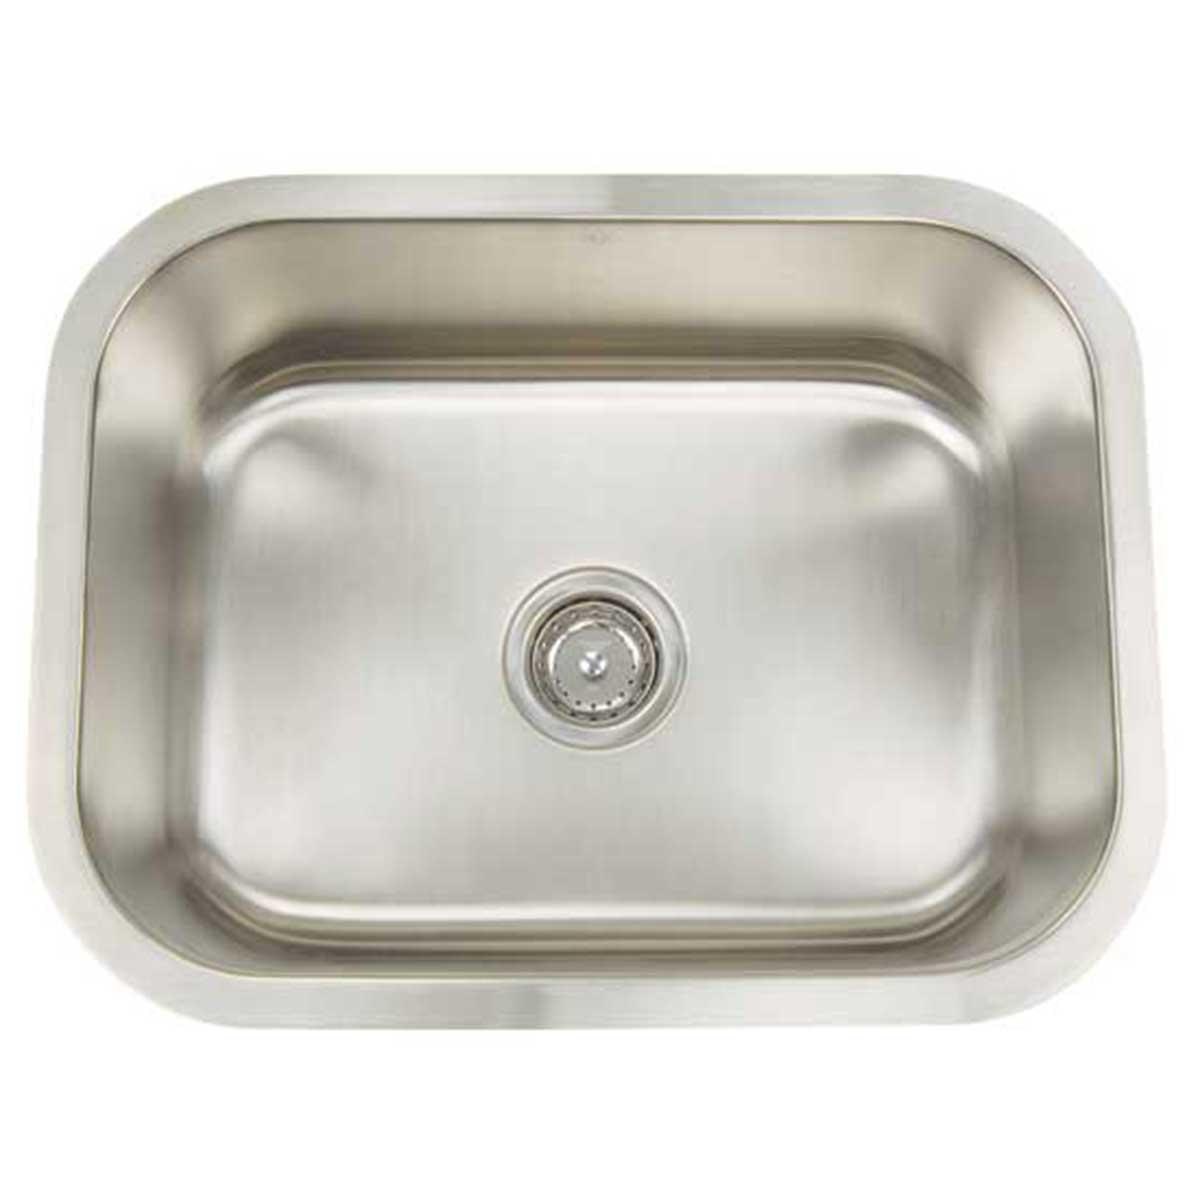 artisan ar2318 d9 single bowl     artisan sinks ar2318 d9 16 gauge  contractors direct   rh   contractorsdirect com